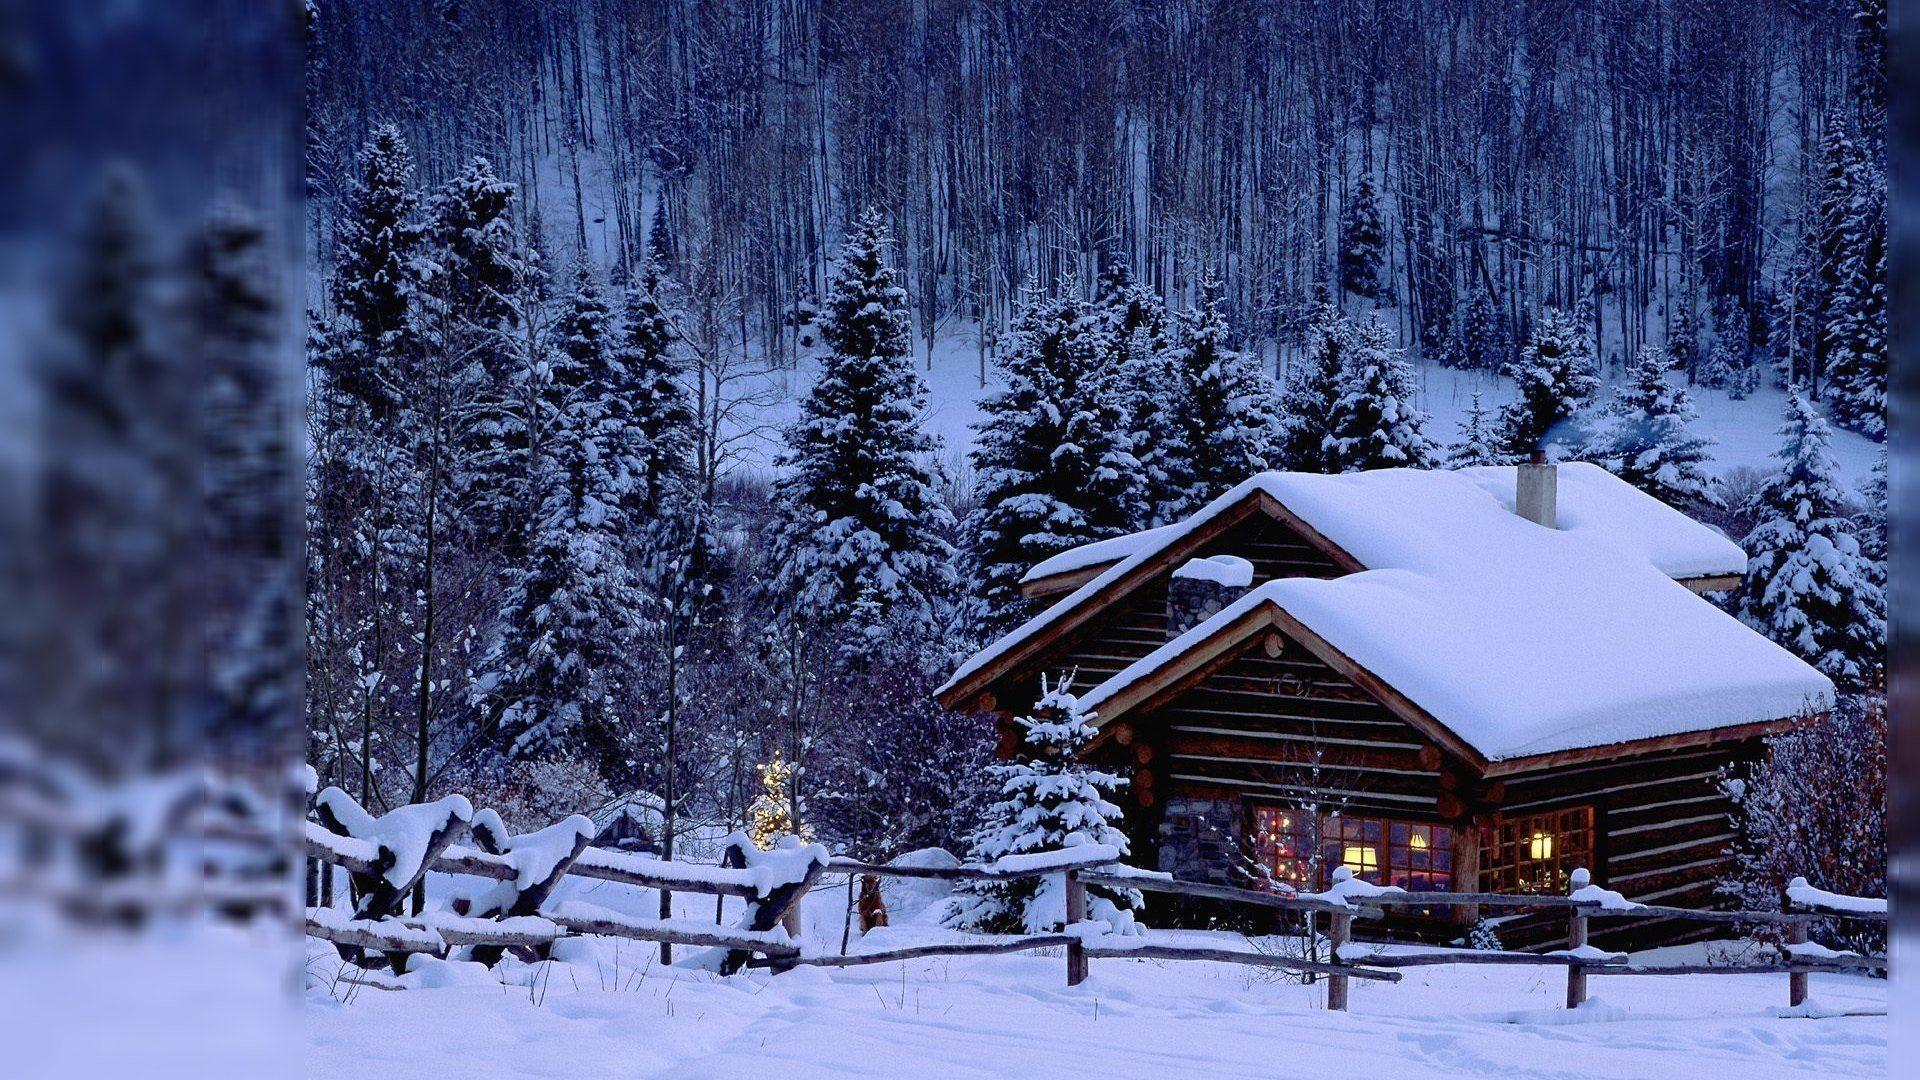 Beautiful Winter Stream Cabins Scene